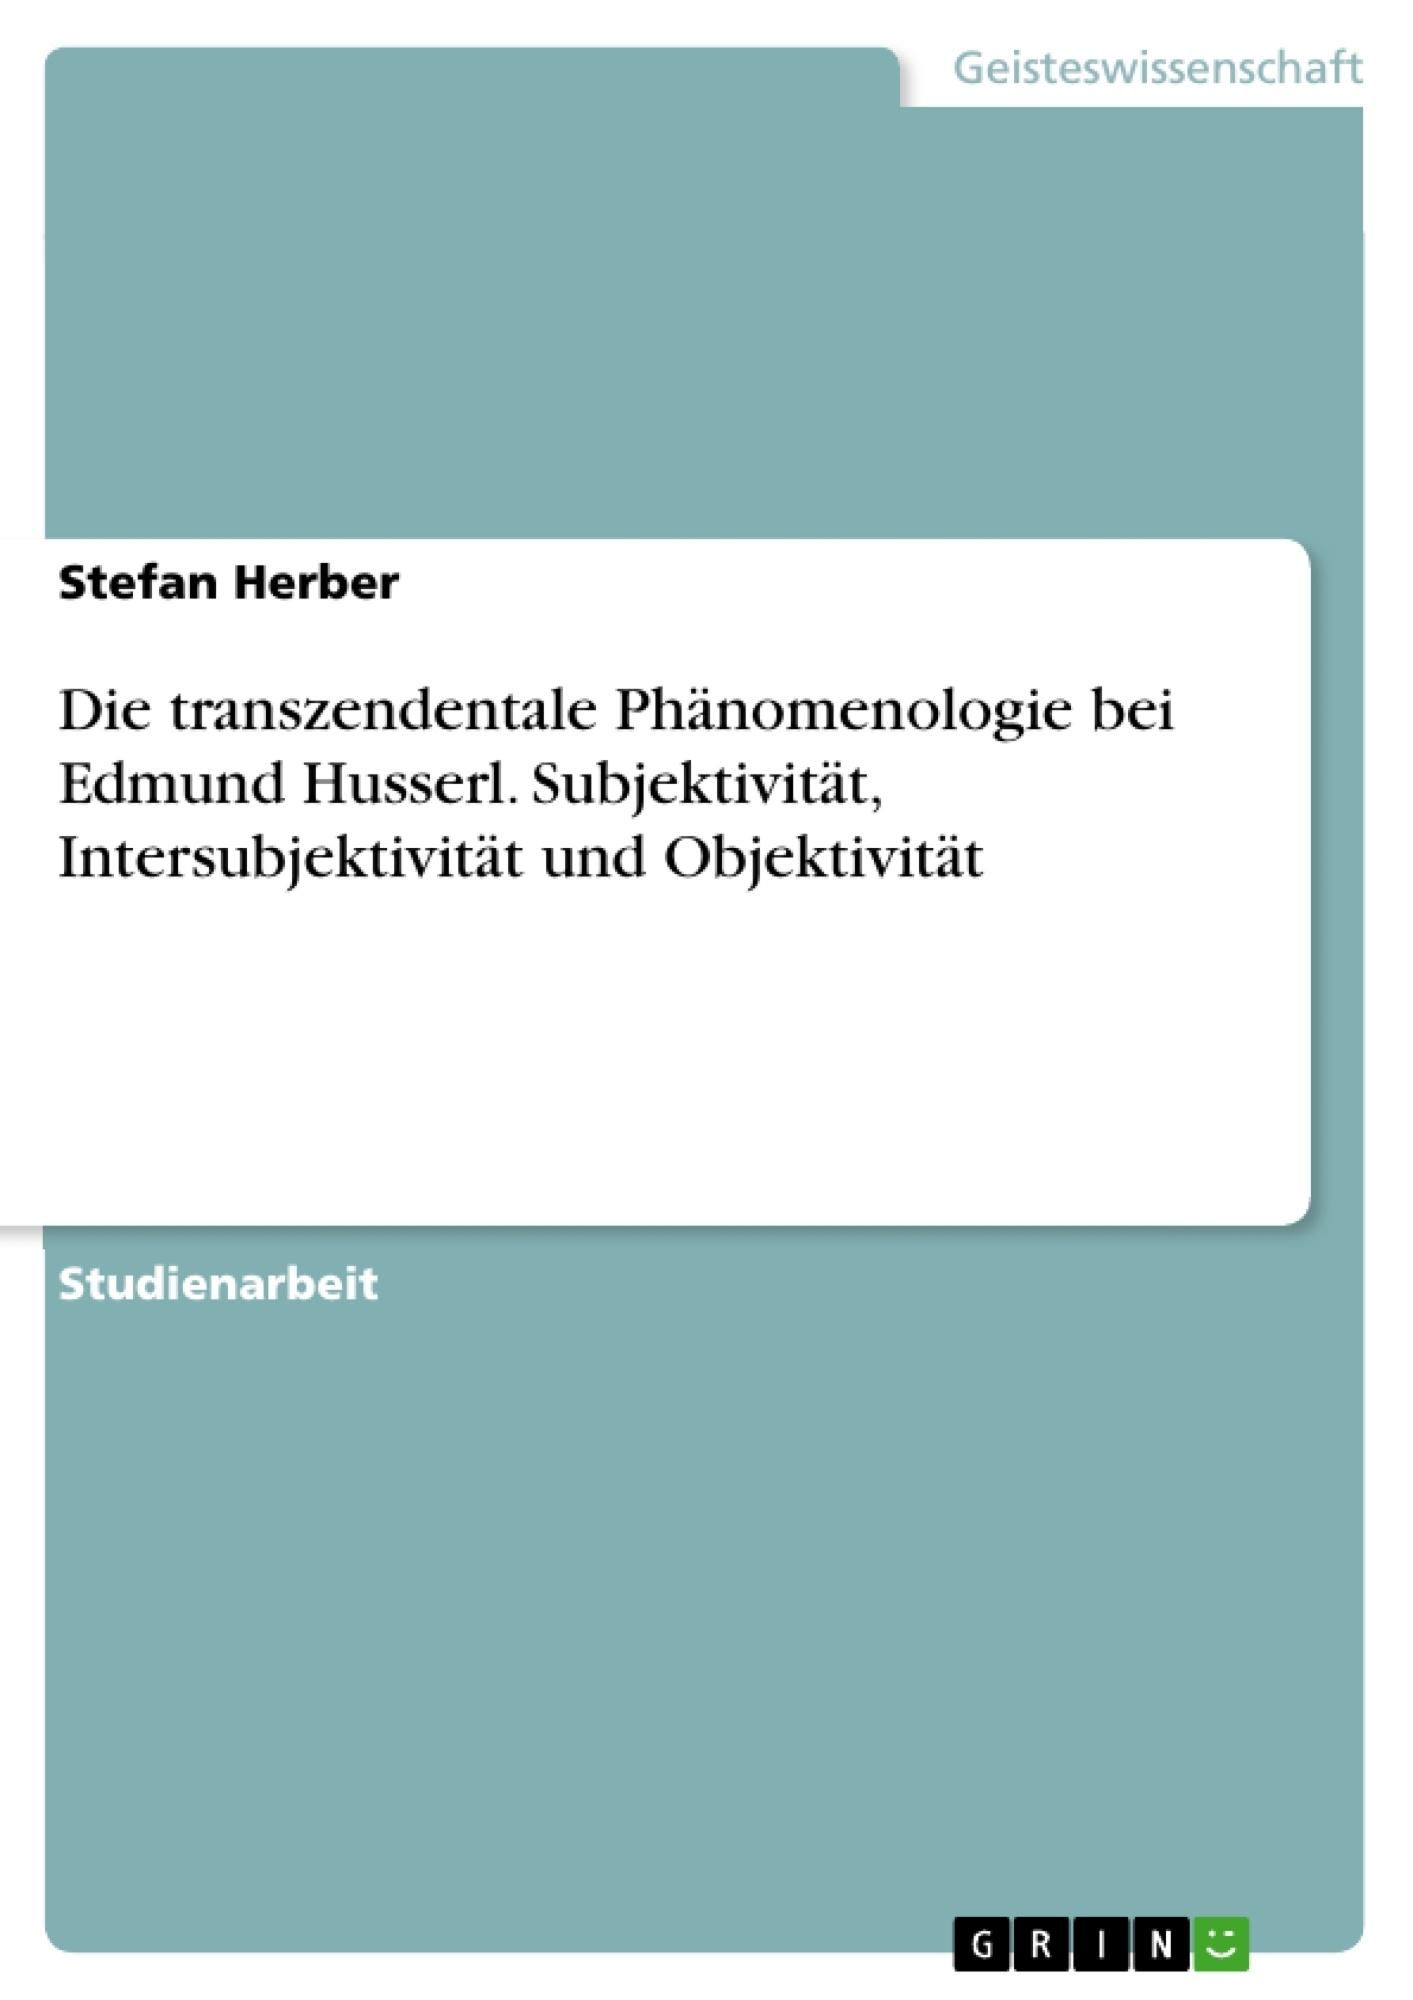 Titel: Die transzendentale Phänomenologie bei Edmund Husserl. Subjektivität, Intersubjektivität und Objektivität